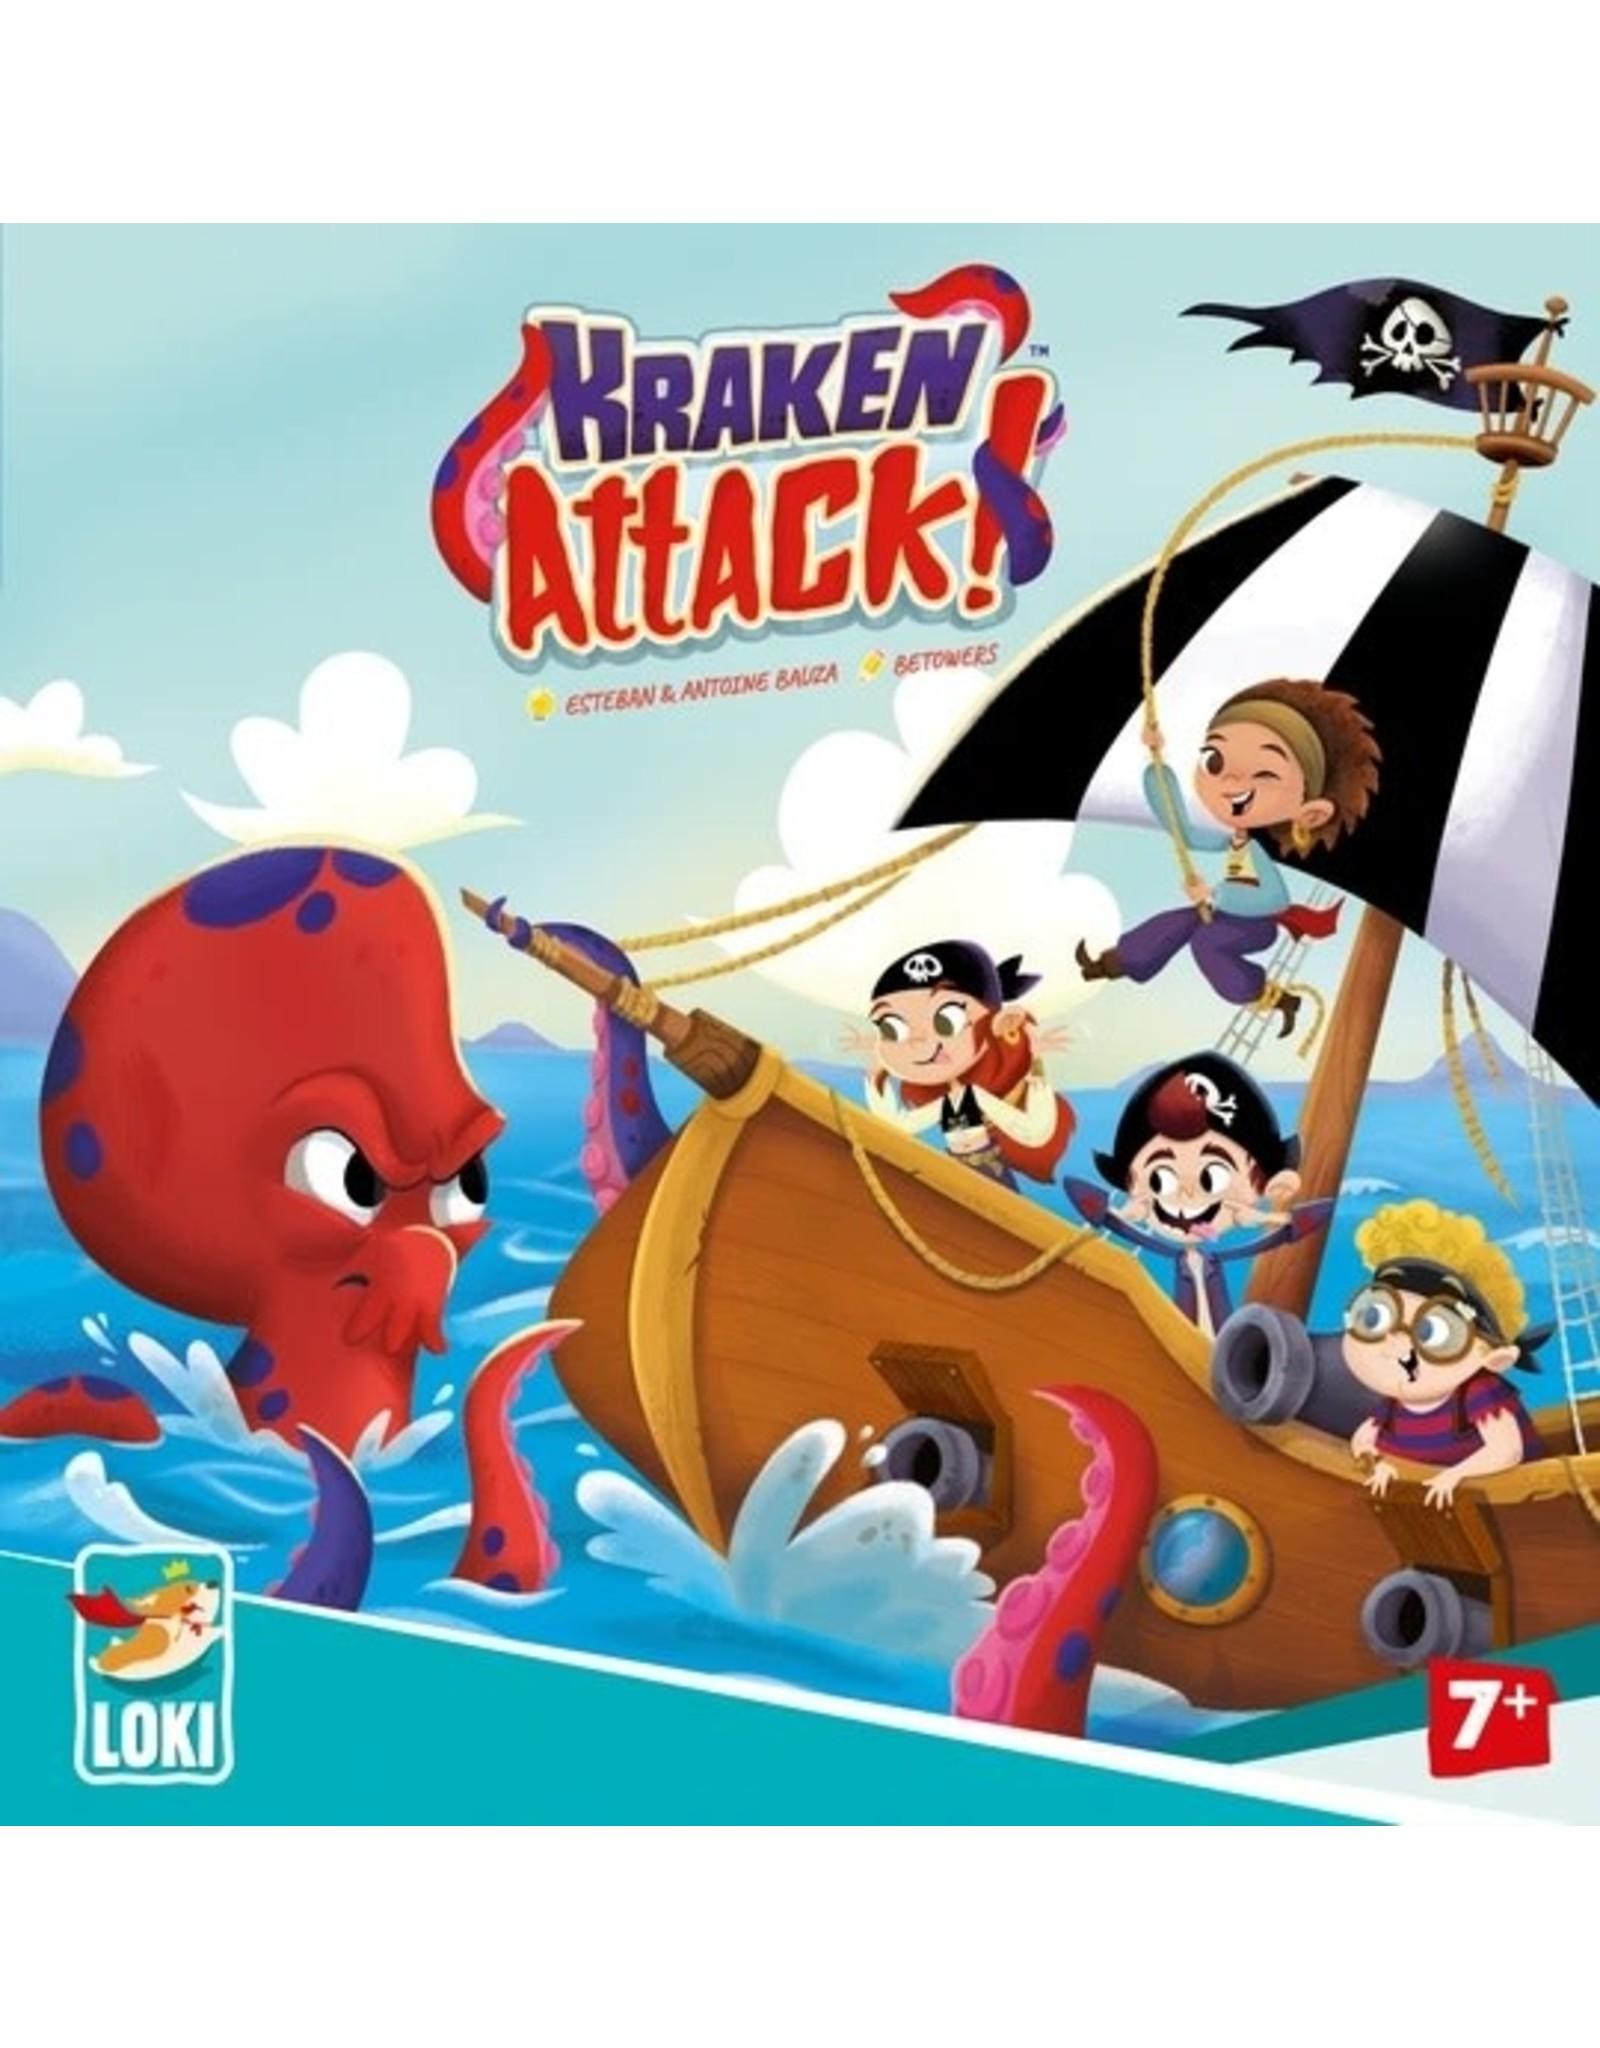 LOKI Kraken Attack